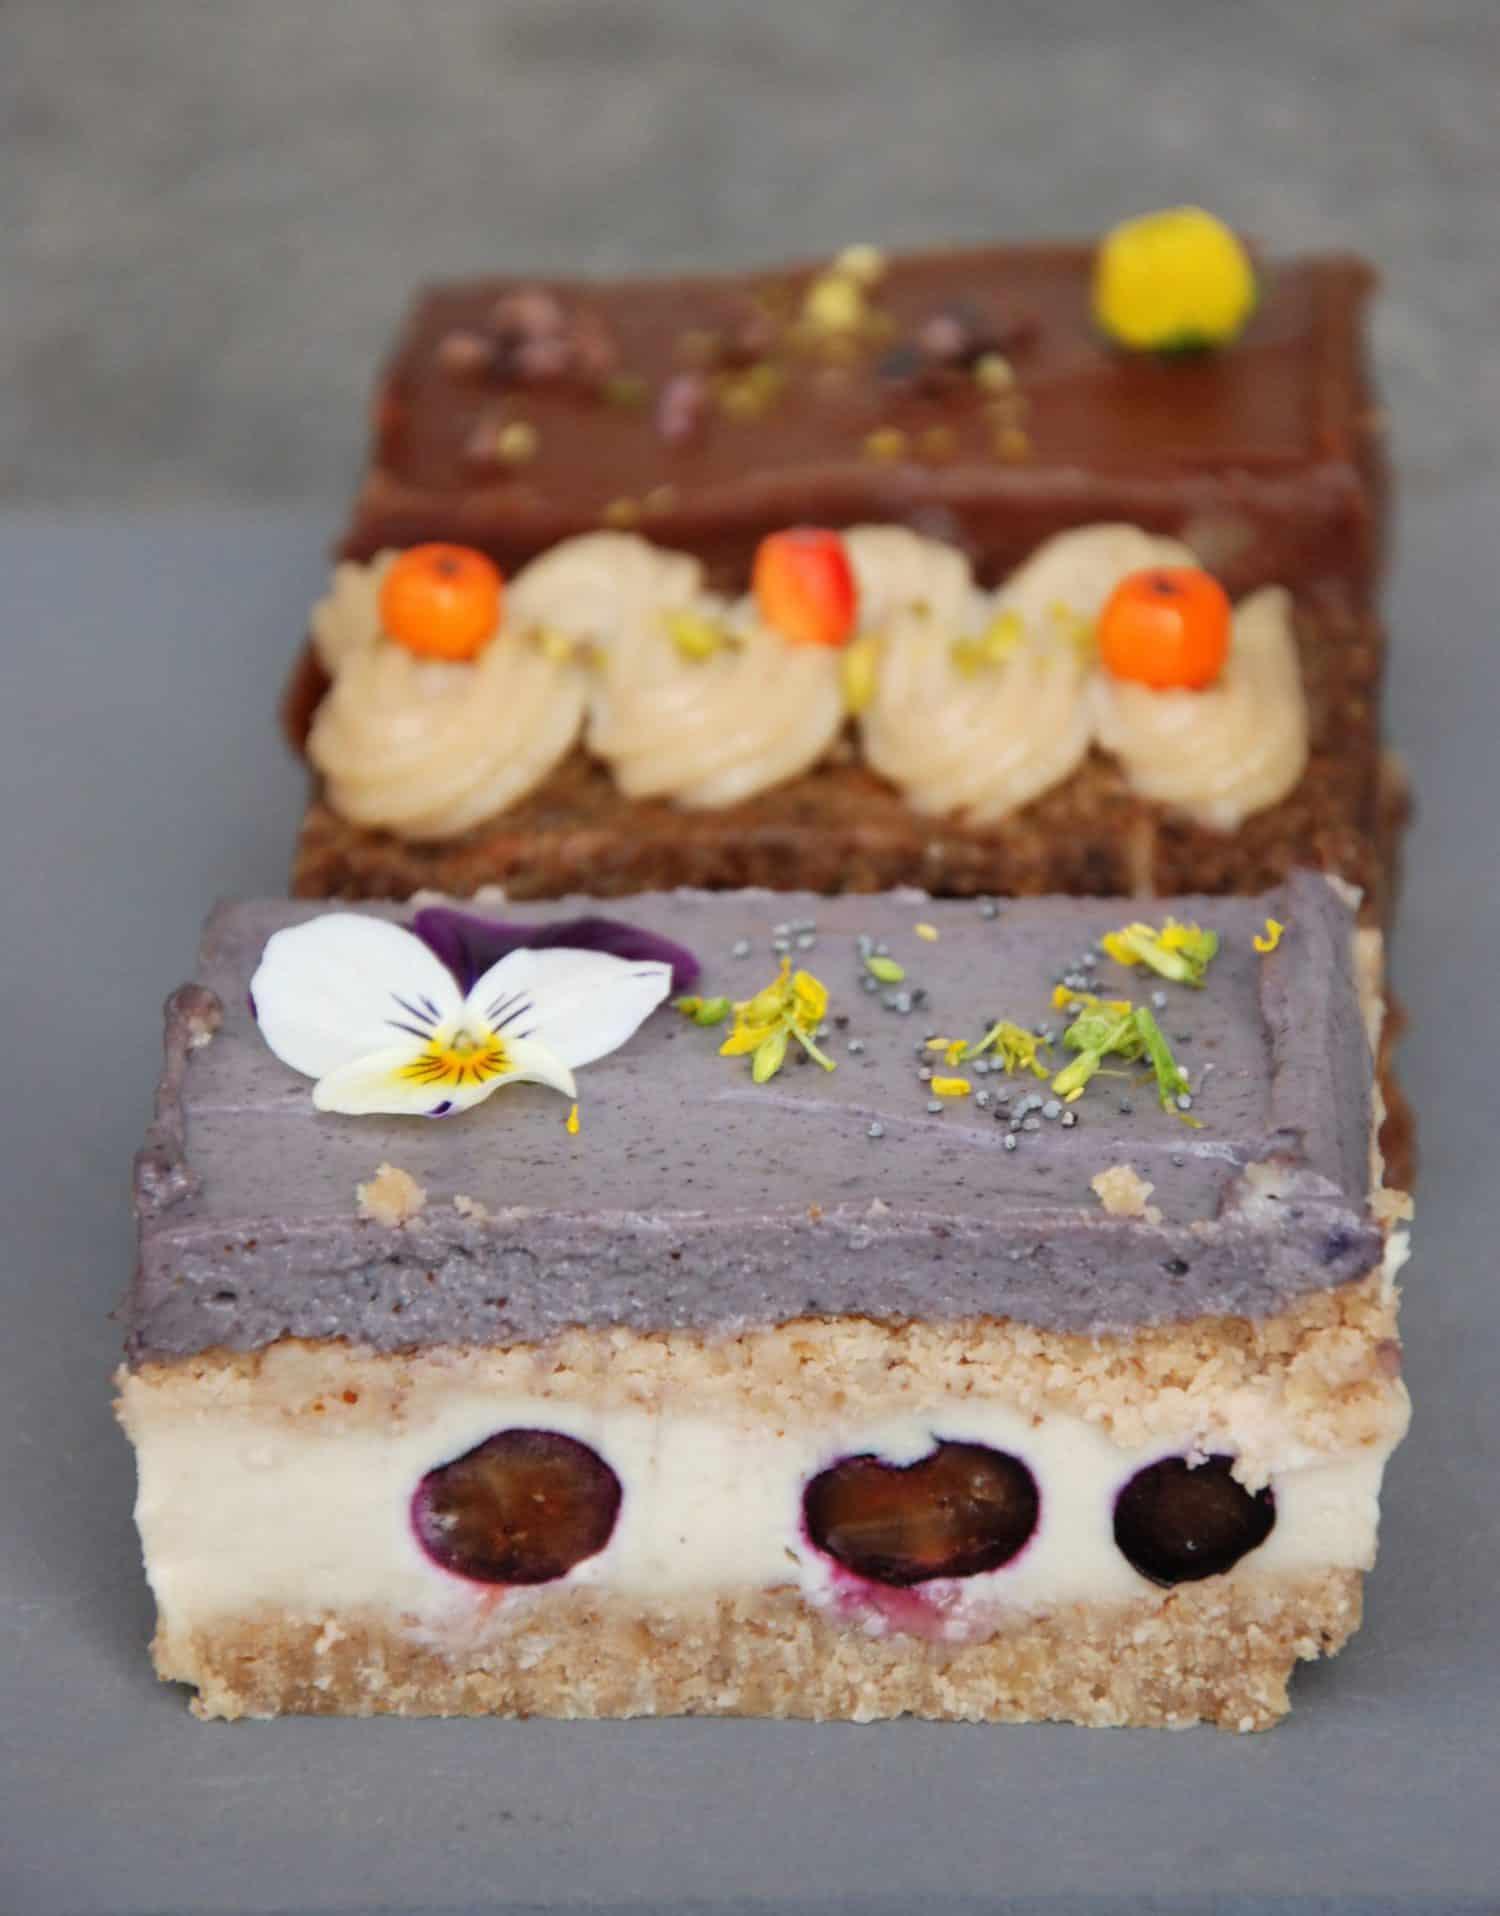 VegfestUK cakes